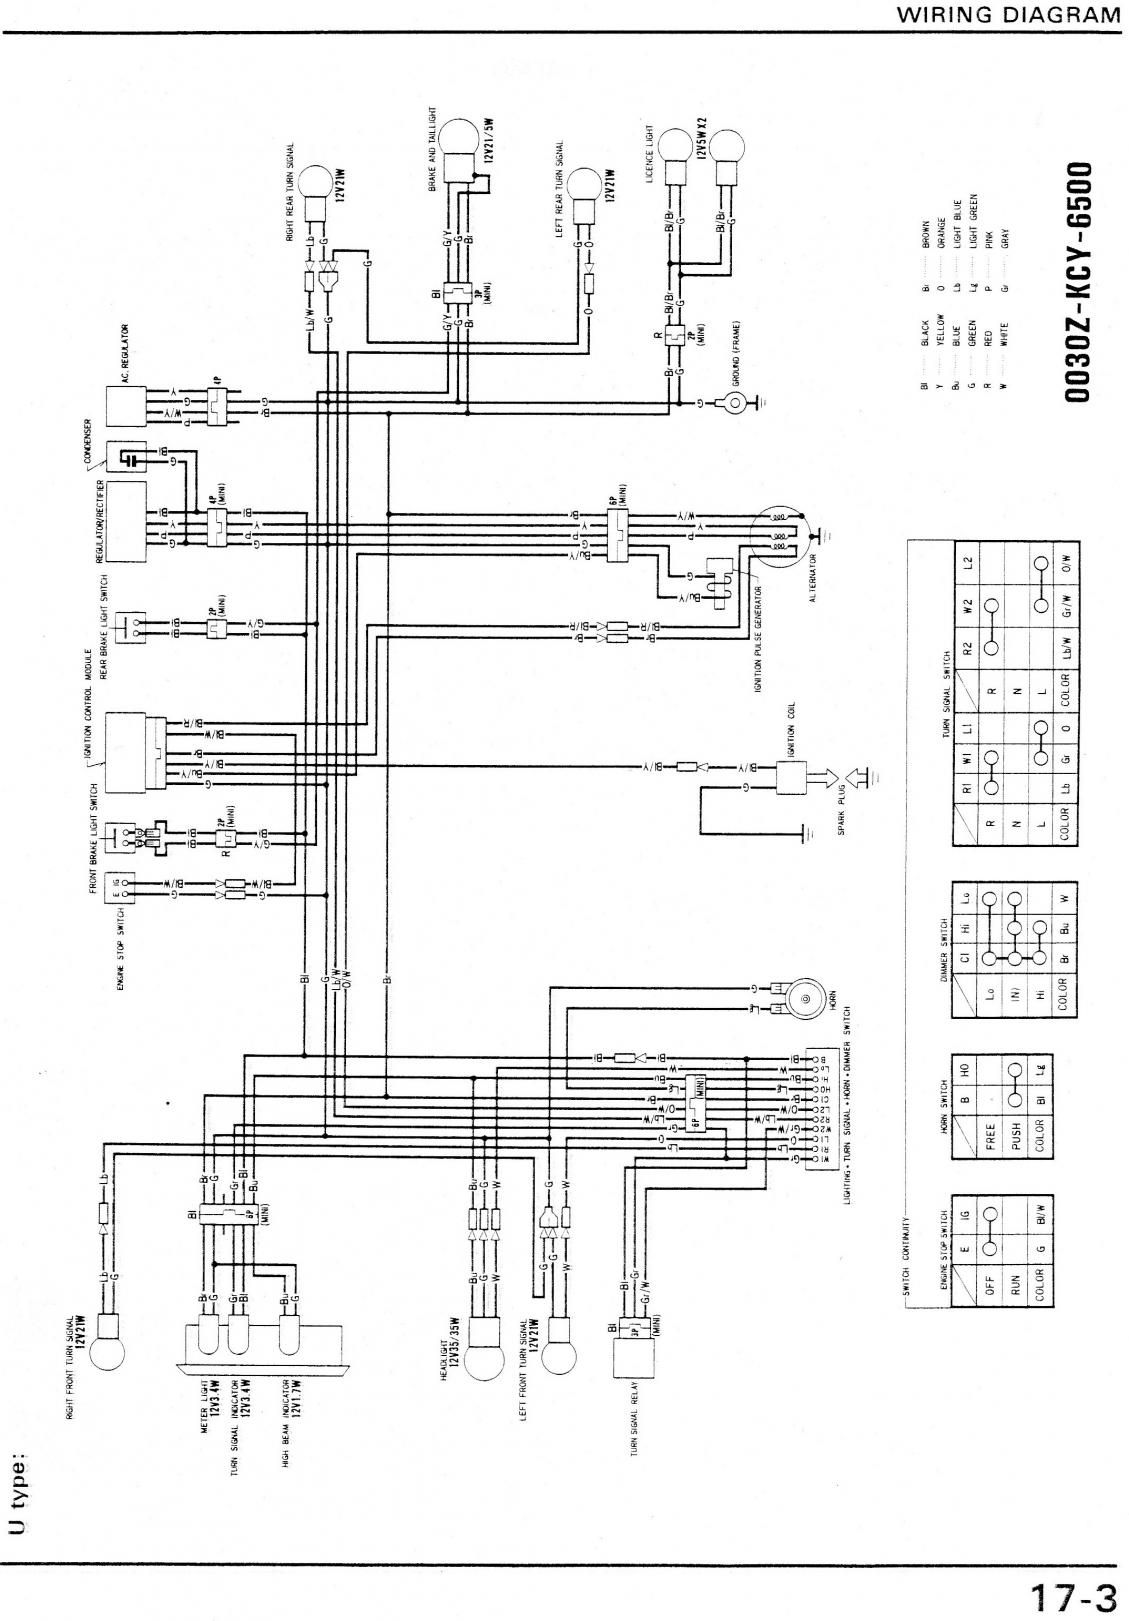 Honda Cr 85 Wiring Diagram Electrical House Library Of Diagrams U2022 Rh Sv Ti Com Cr80